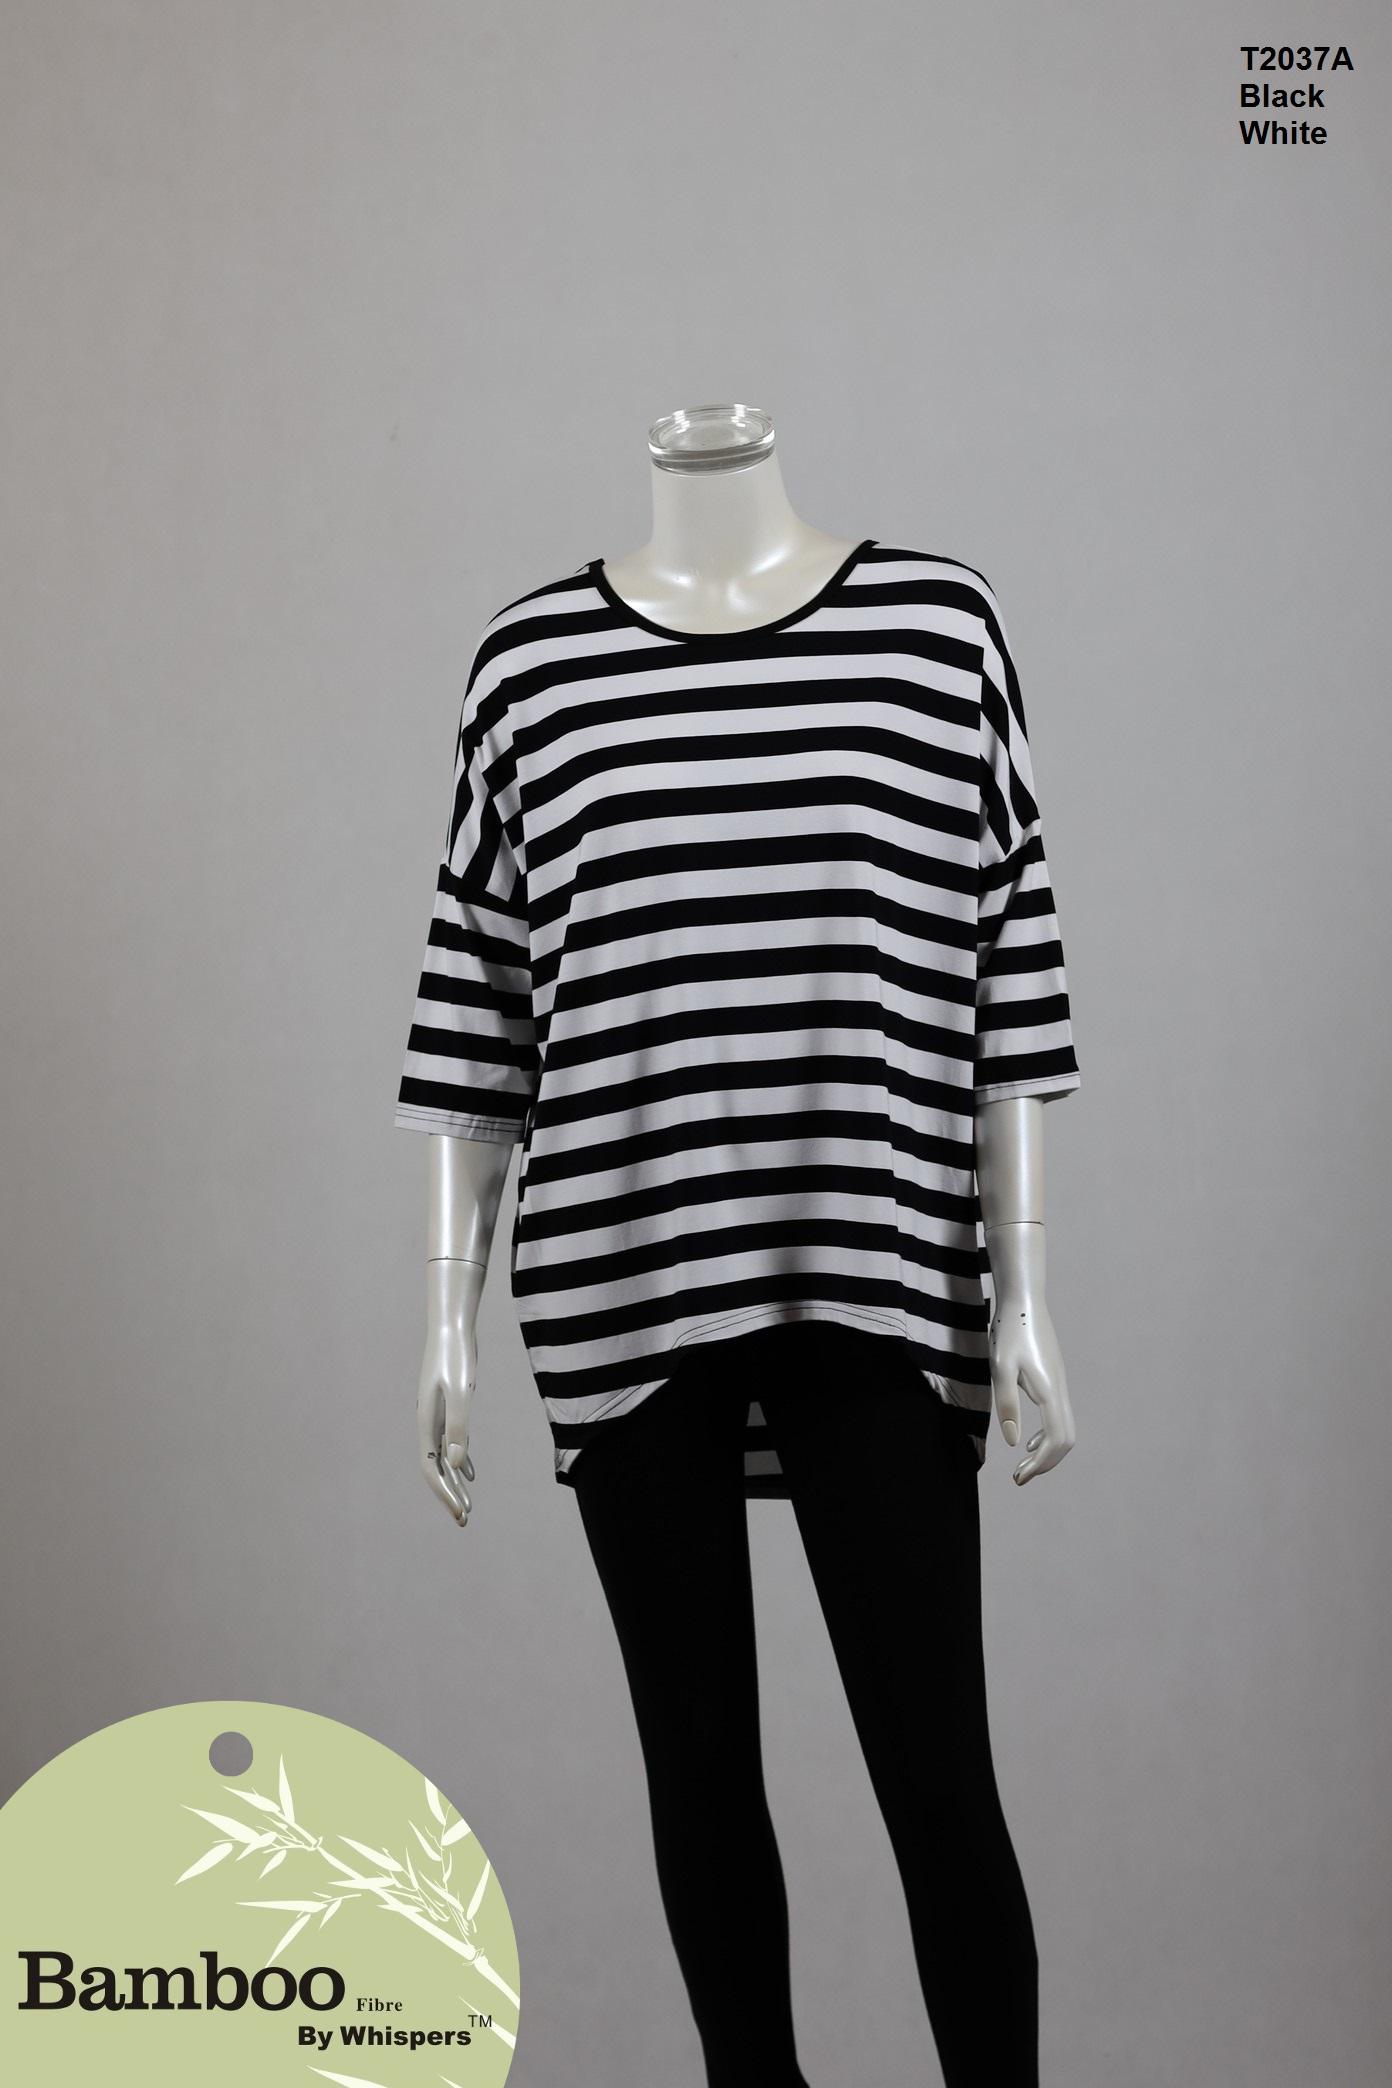 T2037A-Bamboo Top-Black White.JPG